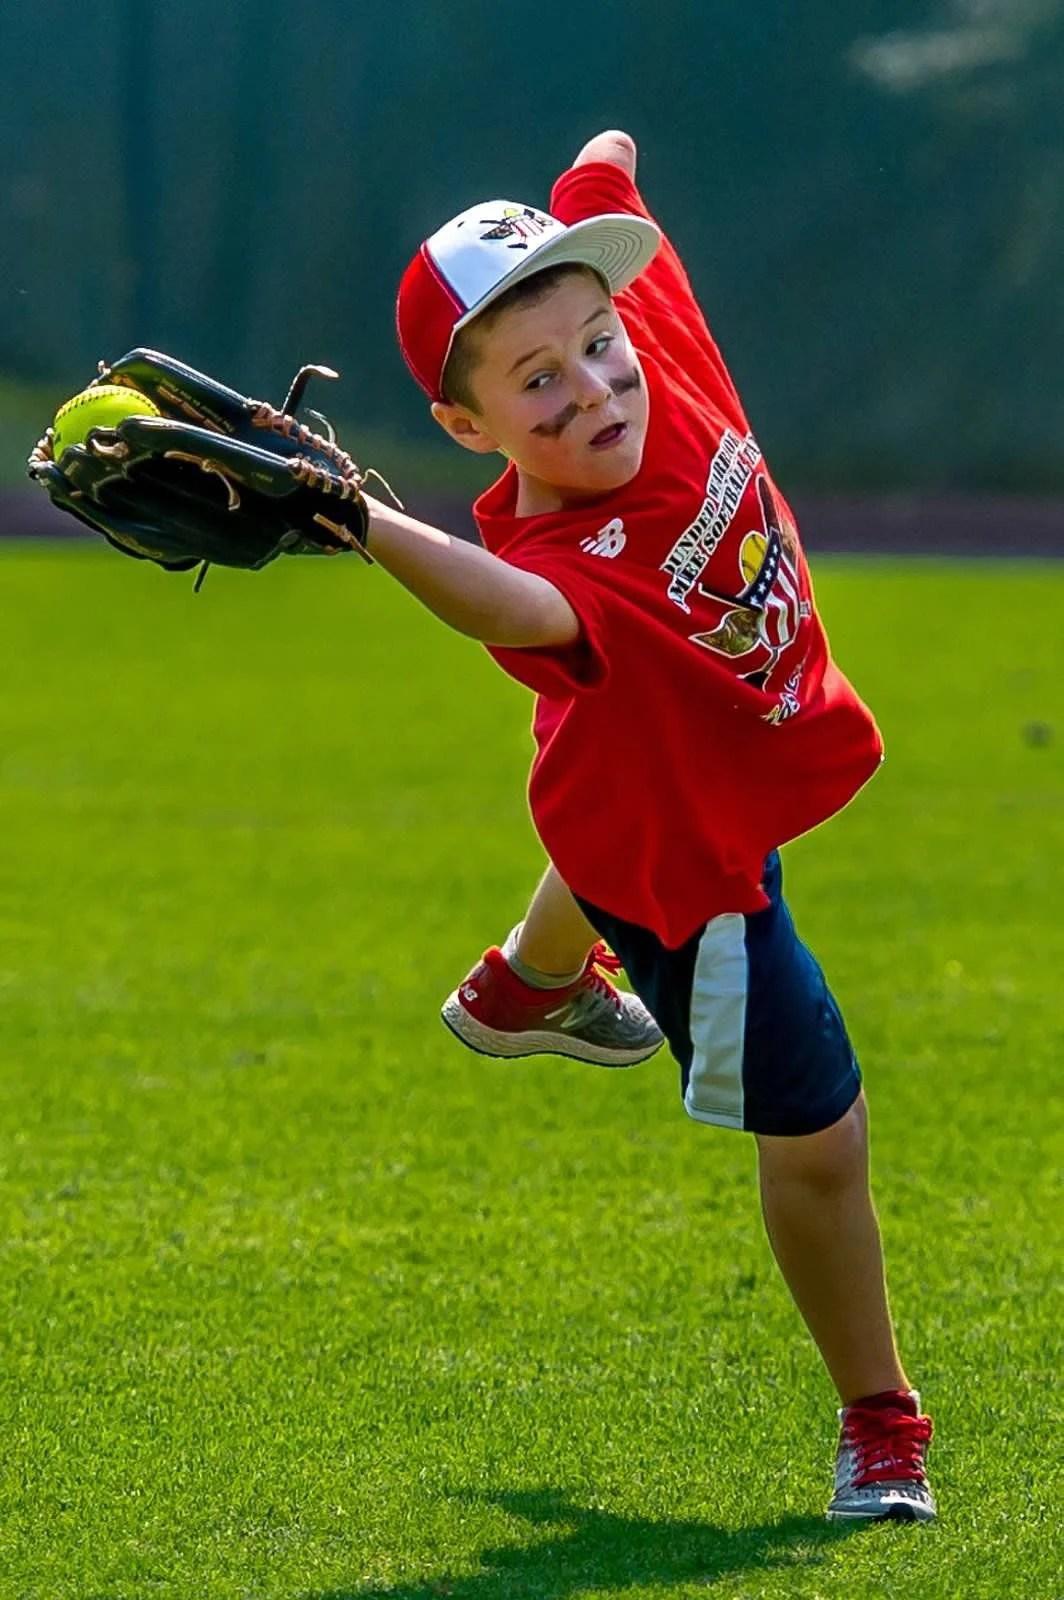 Boy Plays At Amputee Softball Team Kids Camp